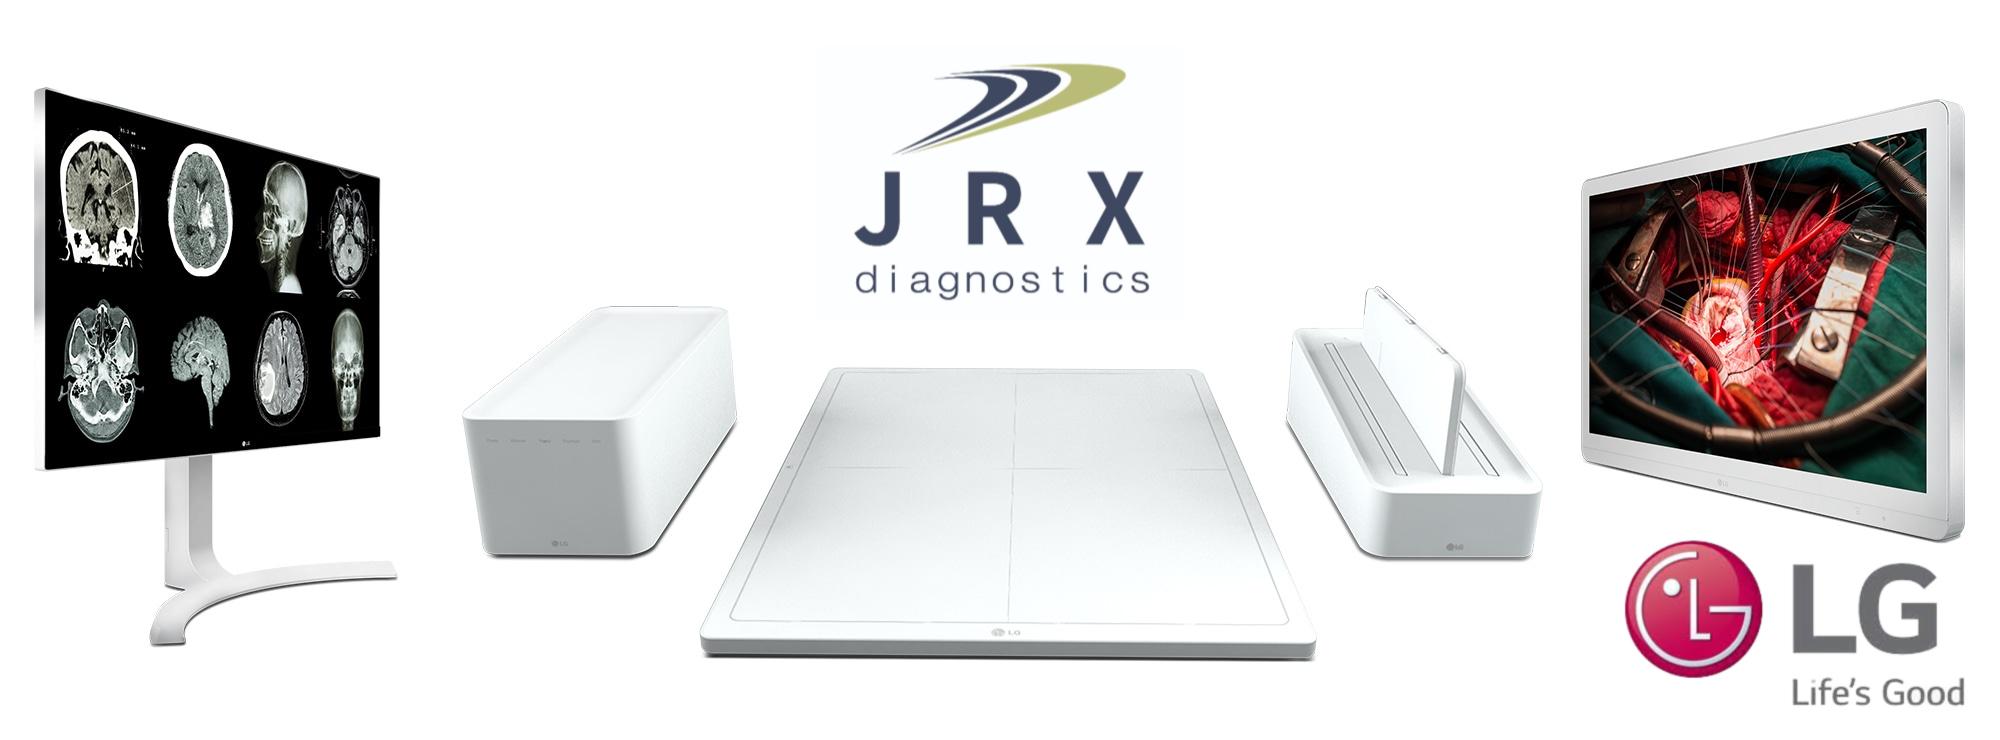 LG Flat Panel X-ray Sensors